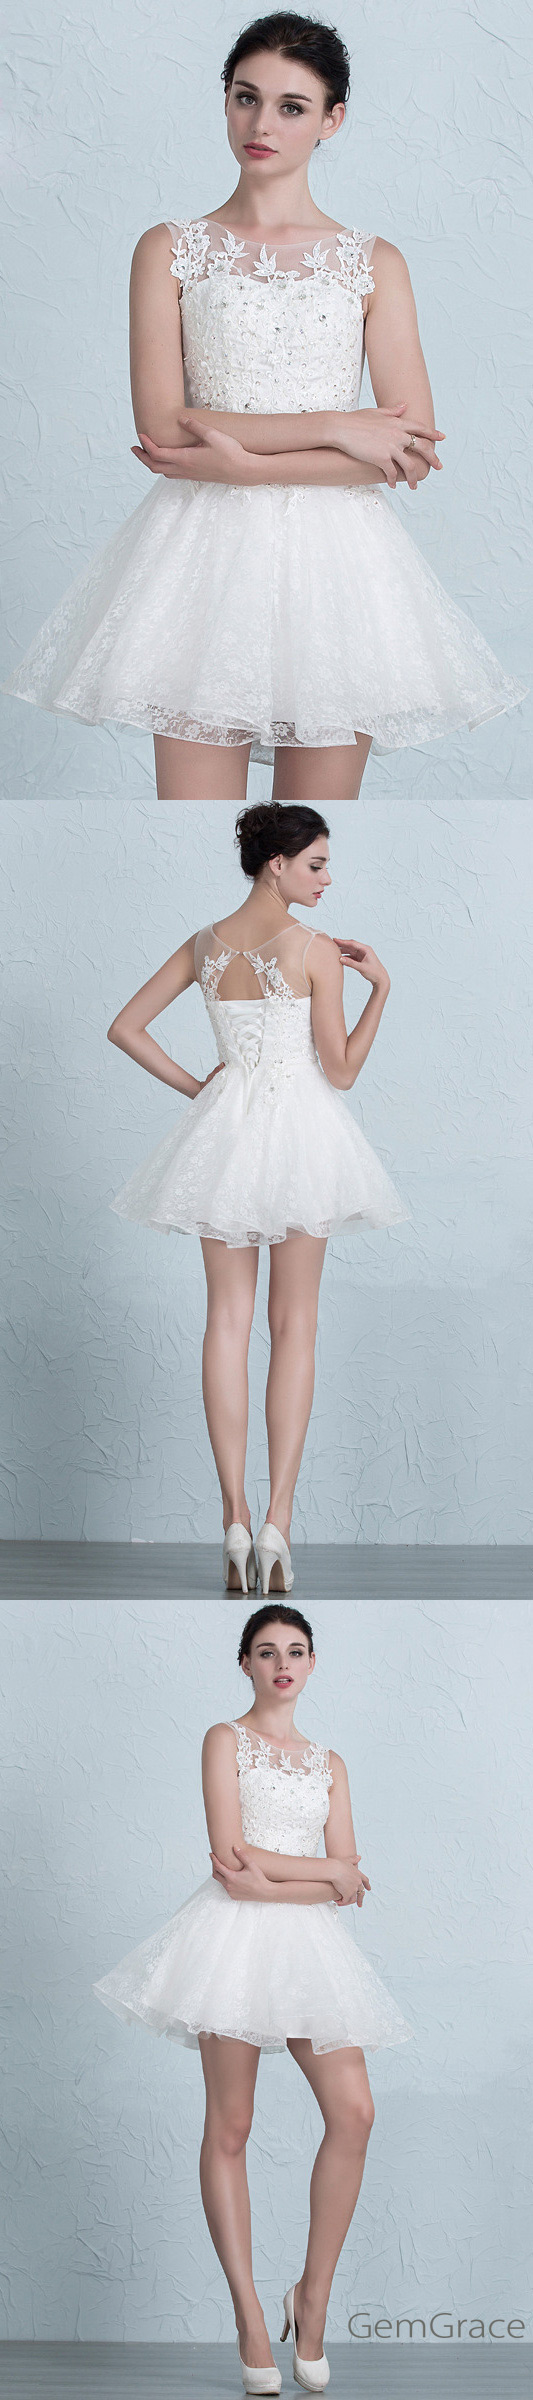 Fine Short White Wedding Reception Dress Adornment - All Wedding ...